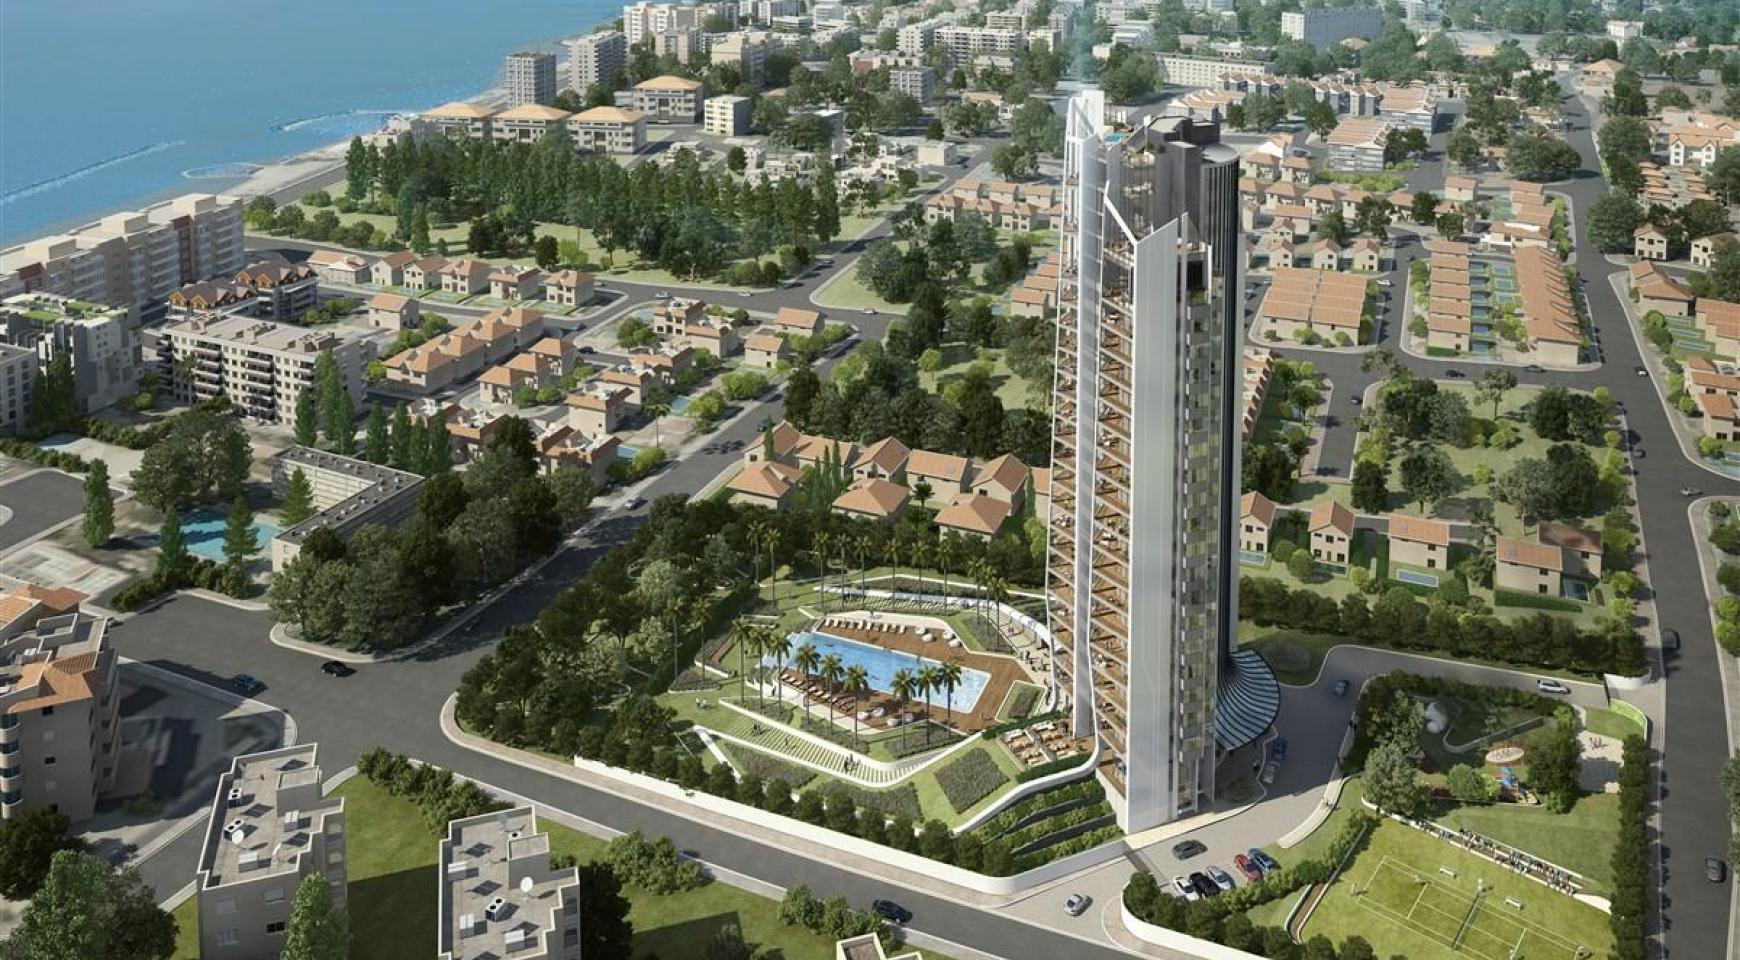 Sky Tower. Μοντέρνο ευρύχωρο διαμέρισμα ενός υπνοδωματίου με θέα στην θάλασσα - 7